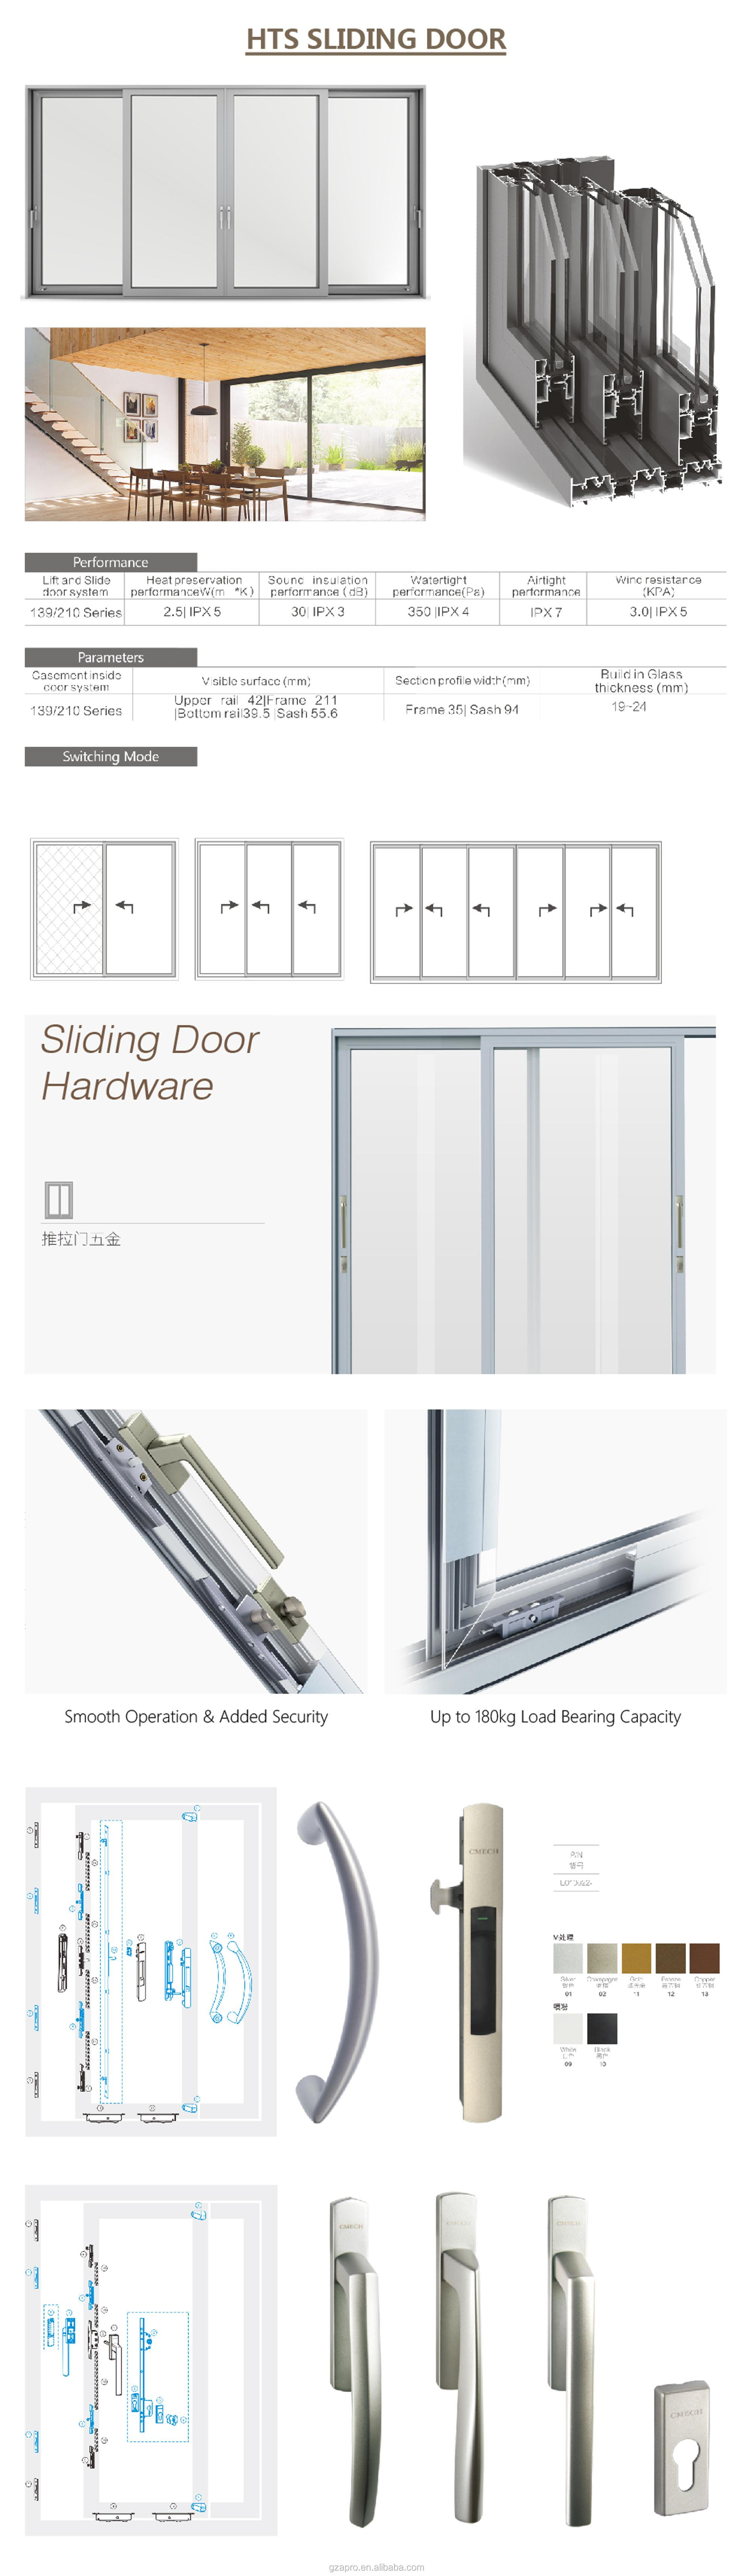 Lift Balkon Preise Gehärtetem Rahmen Terrassentüren System ...